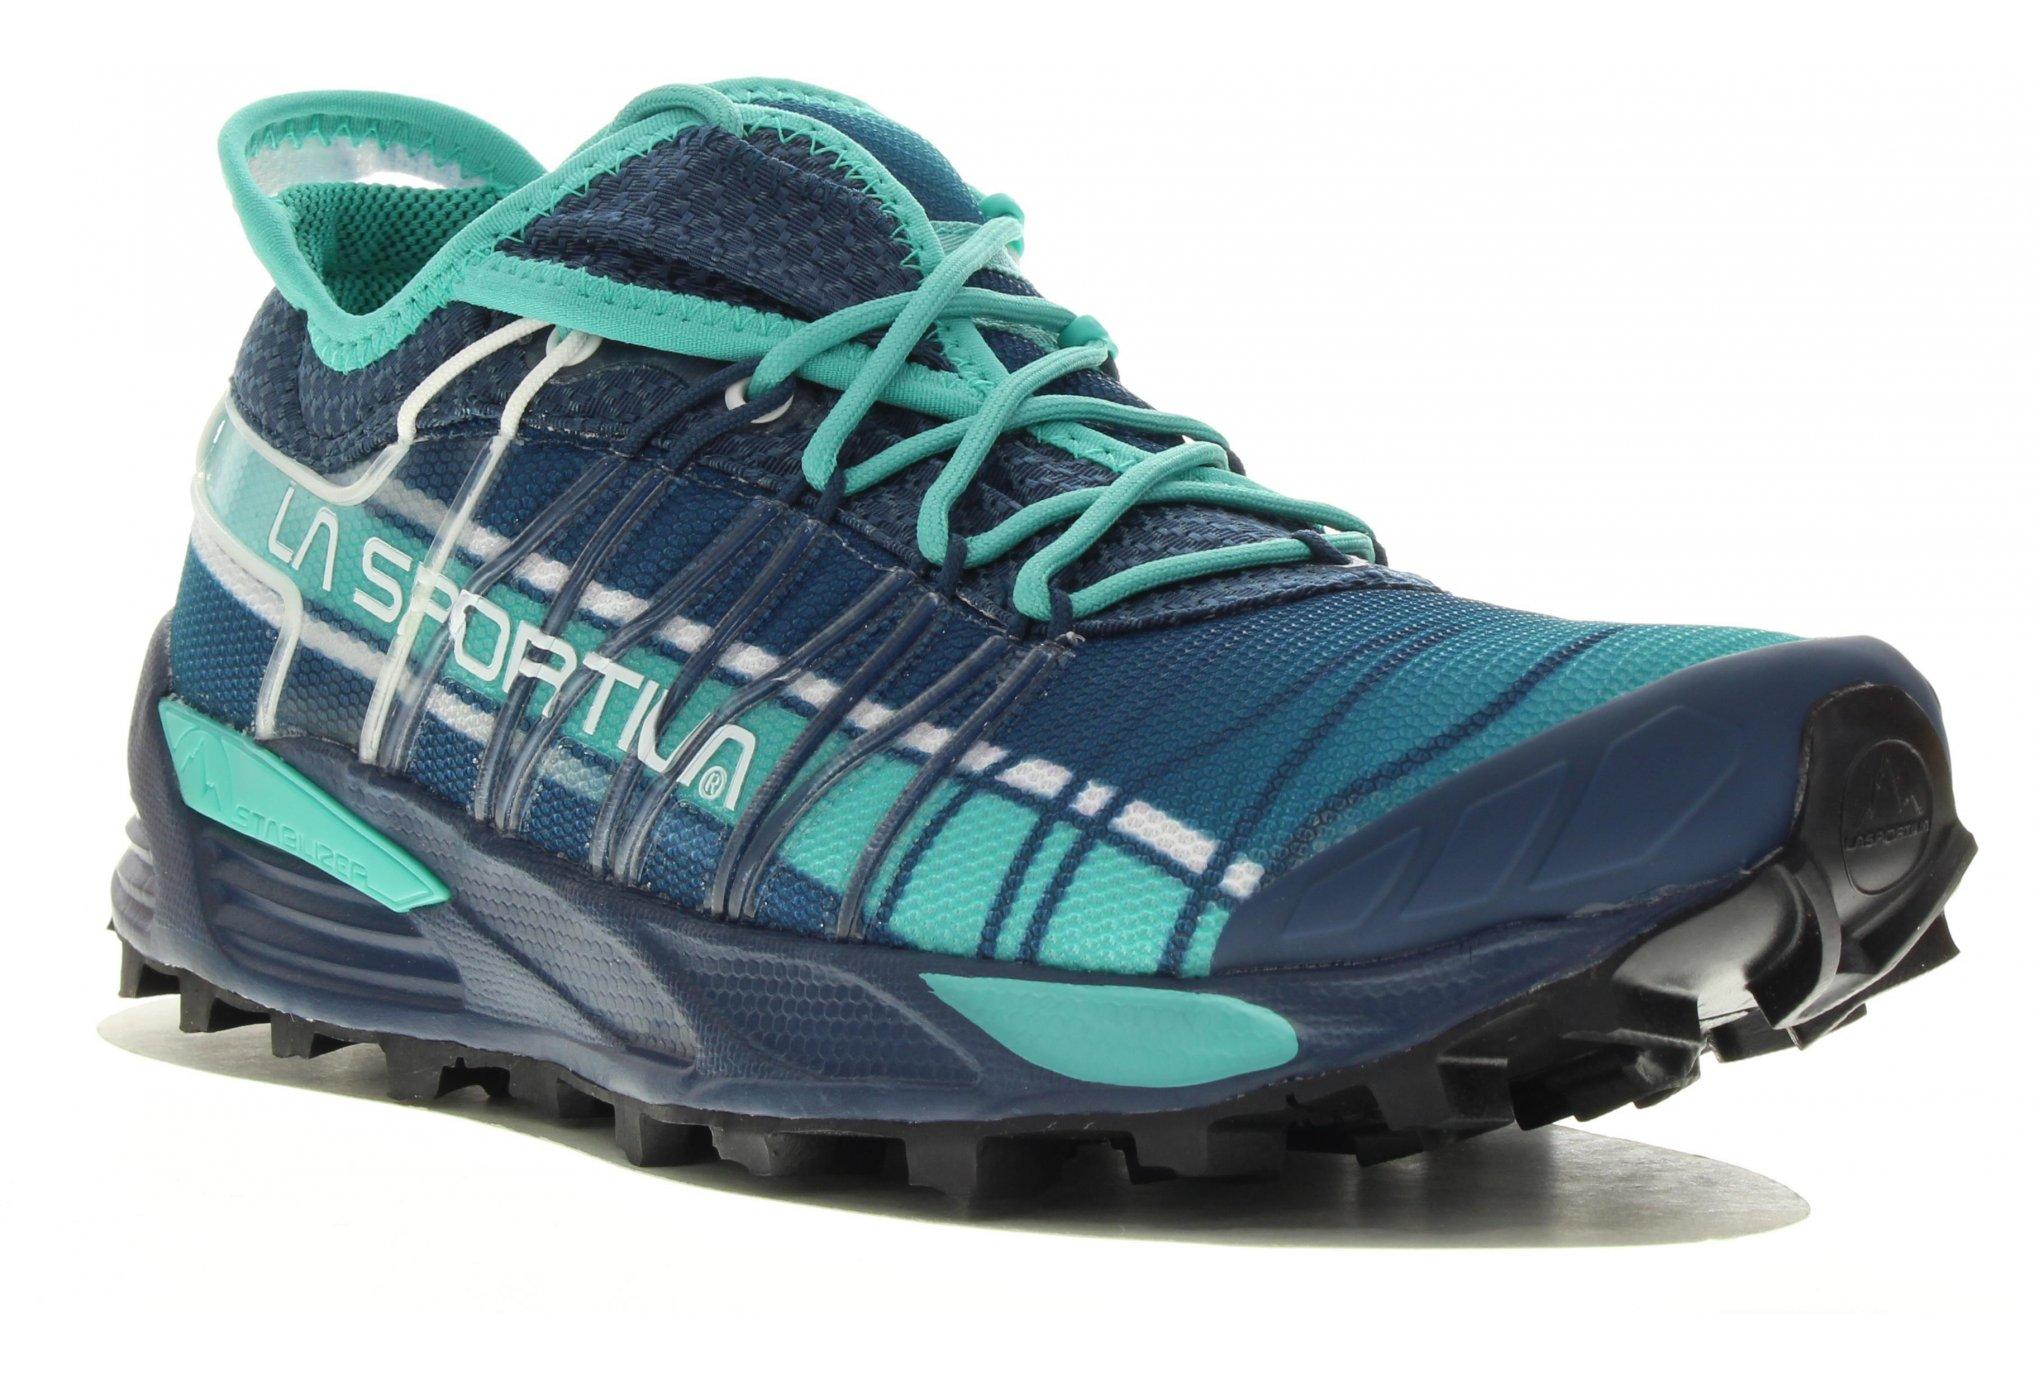 La Sportiva Mutant Chaussures running femme